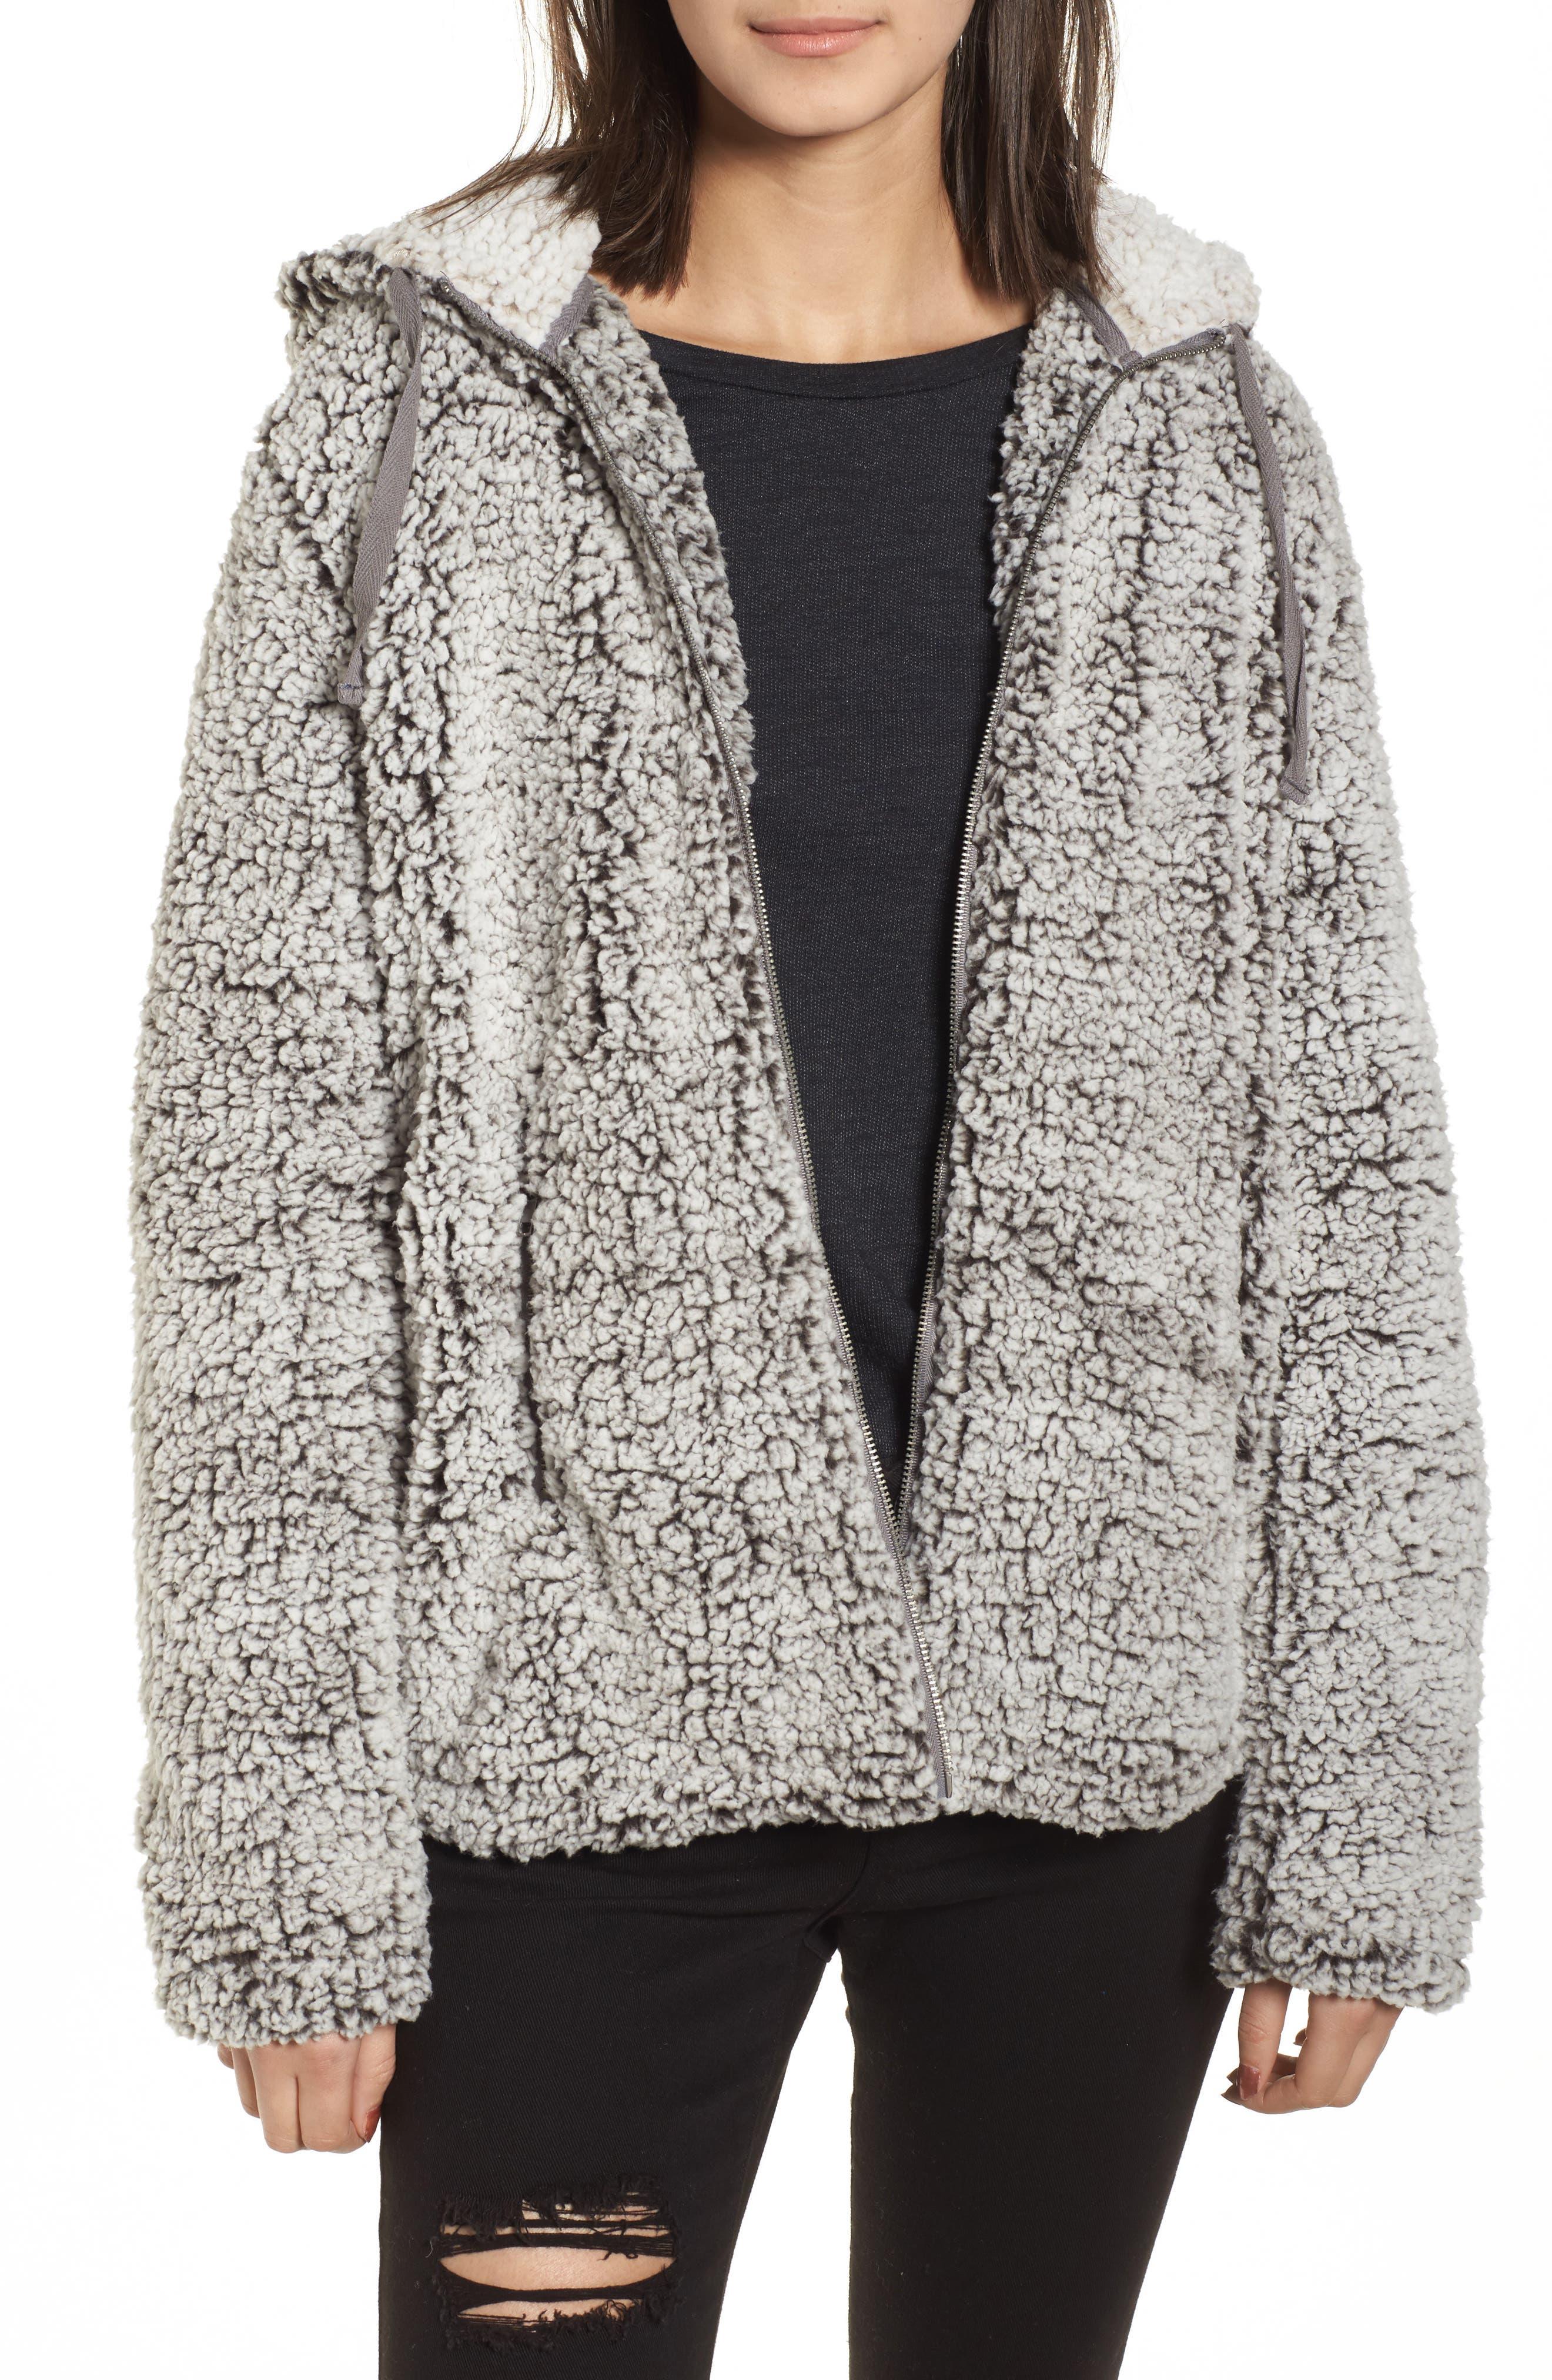 Alternate Image 1 Selected - Thread & Supply Brandon Fleece Jacket